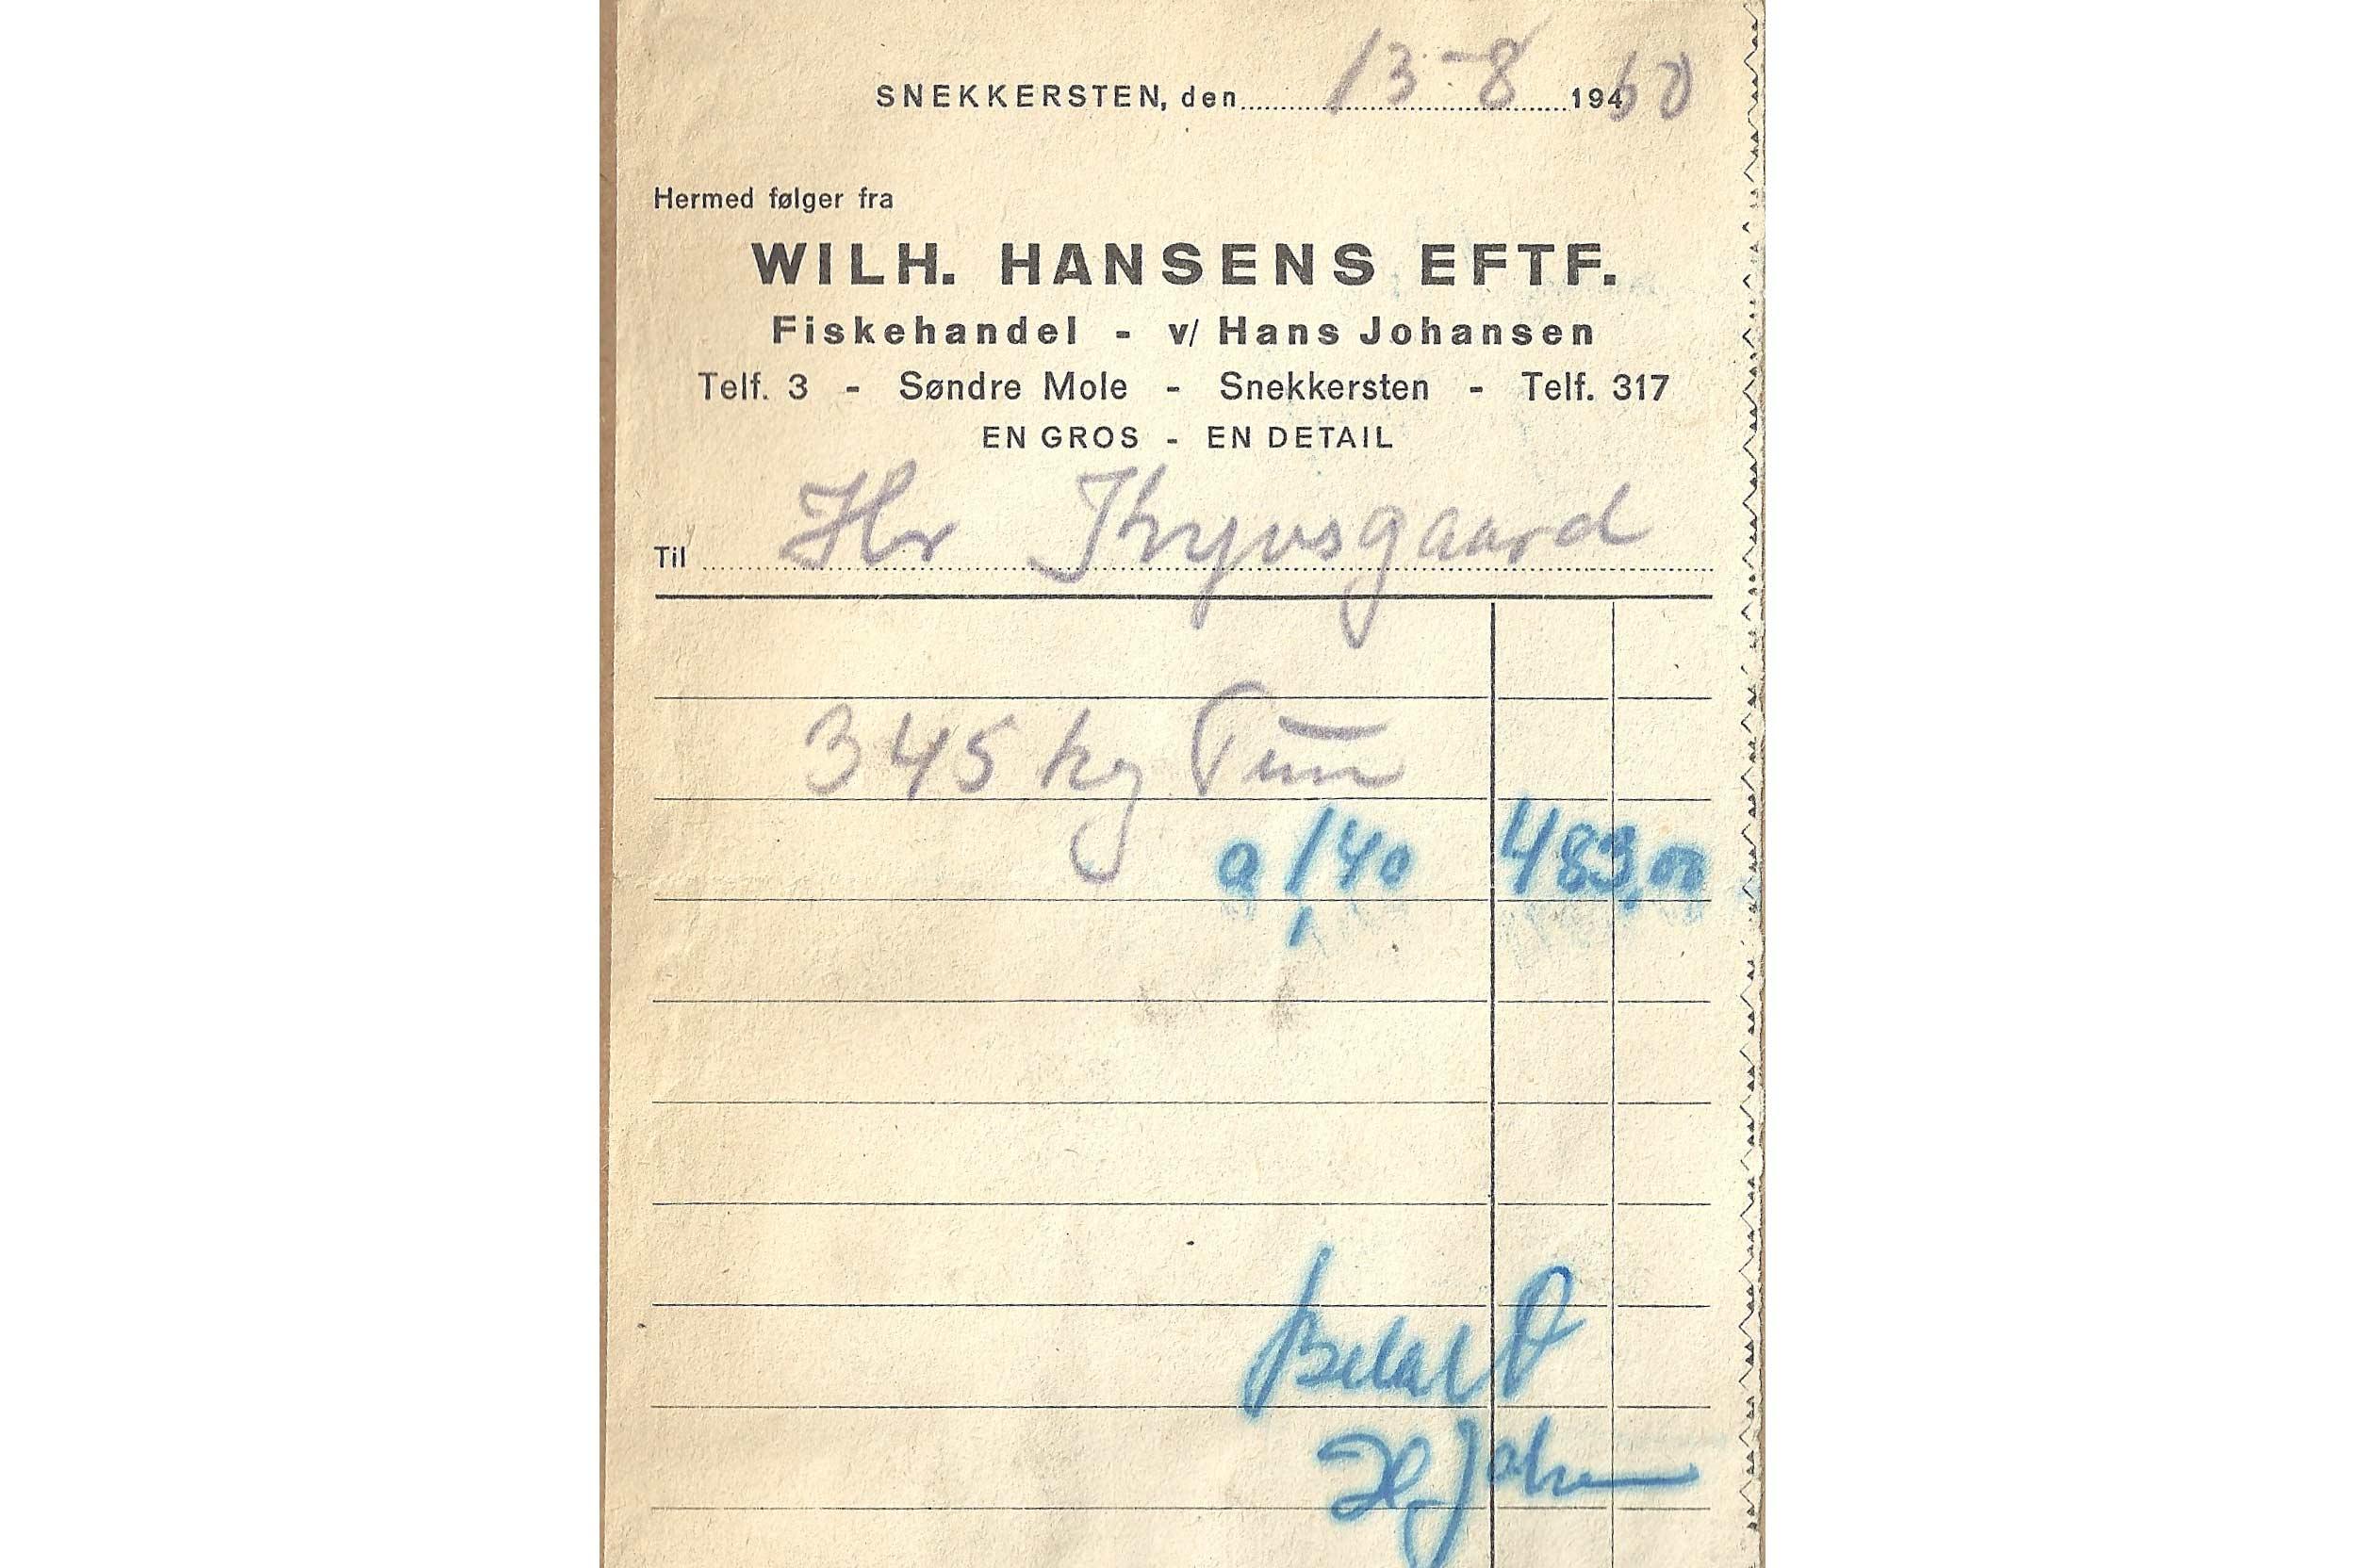 483 kroner fik Knud Kyvsgaard for sin danske rekord tun i renset tilstand. I dag må man som lystfisker ikke sælge sin fangst.